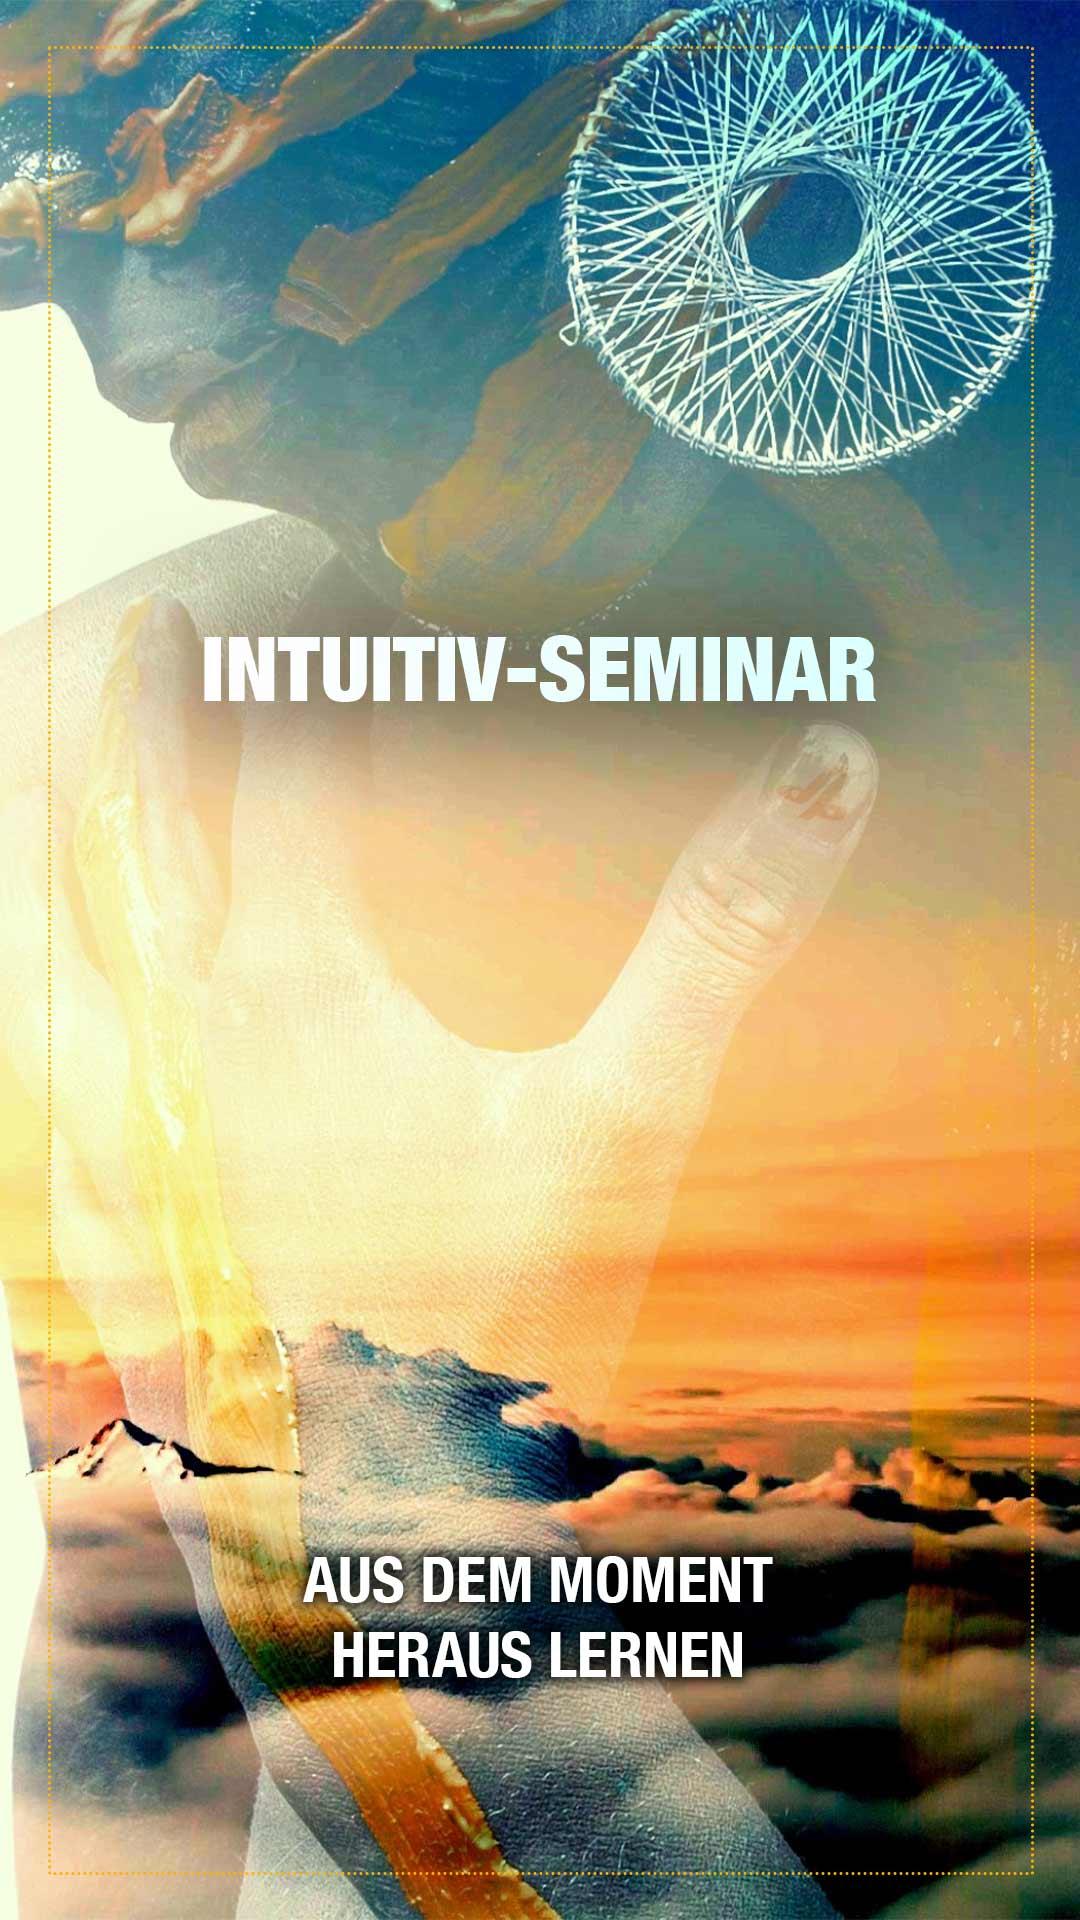 Intuitiv-Seminar